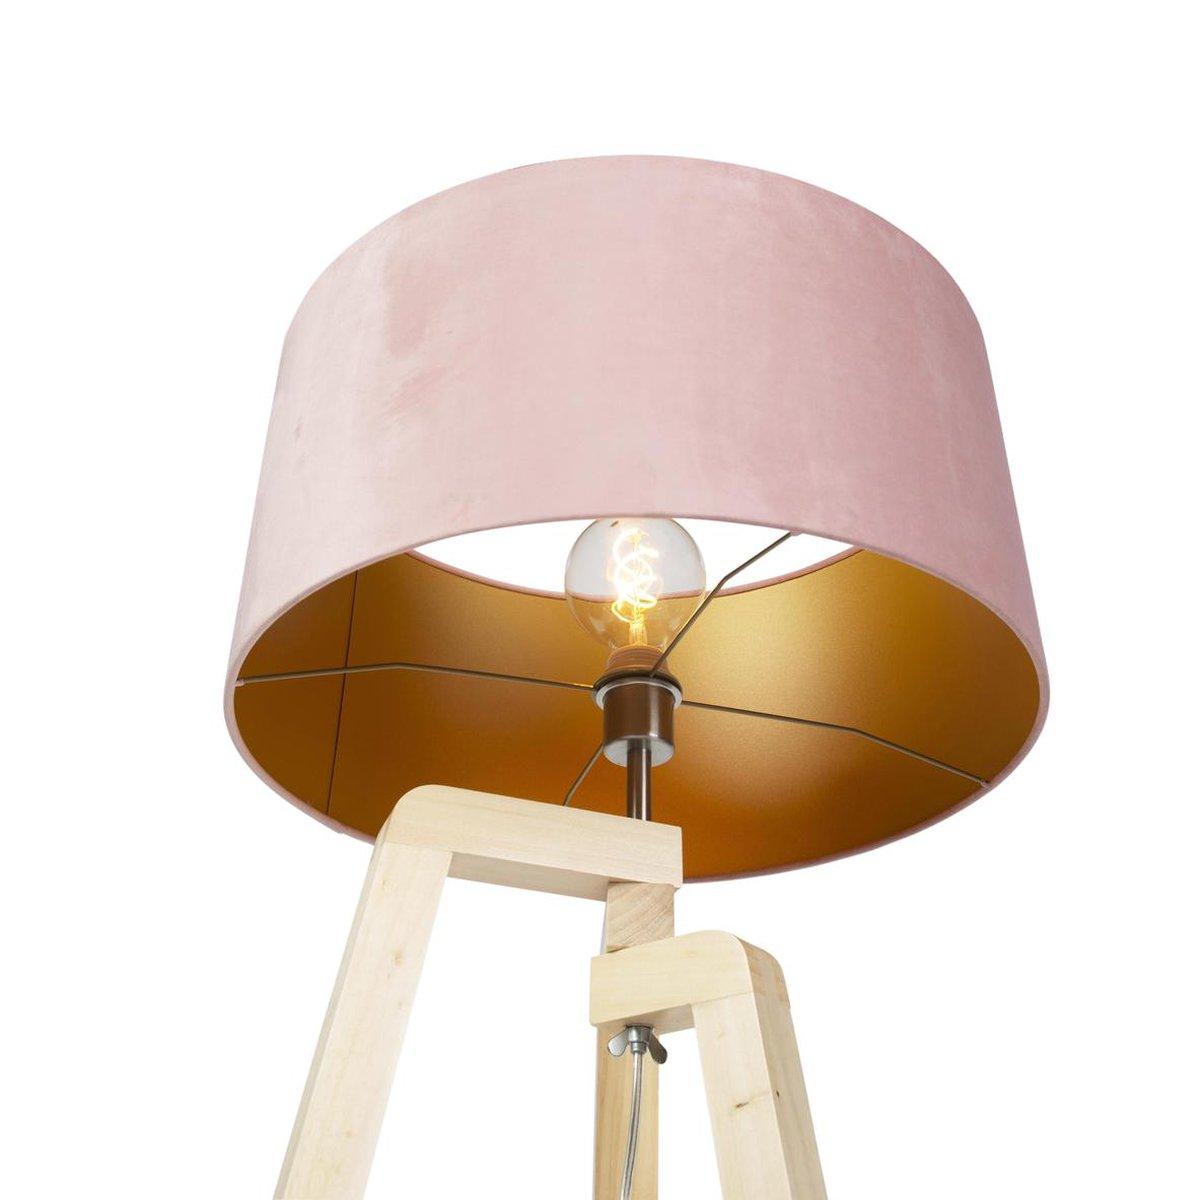 Bol Com Qazqa Puros Tripod Driepoot Vloerlamp 1 Lichts H 1450 Mm Roze